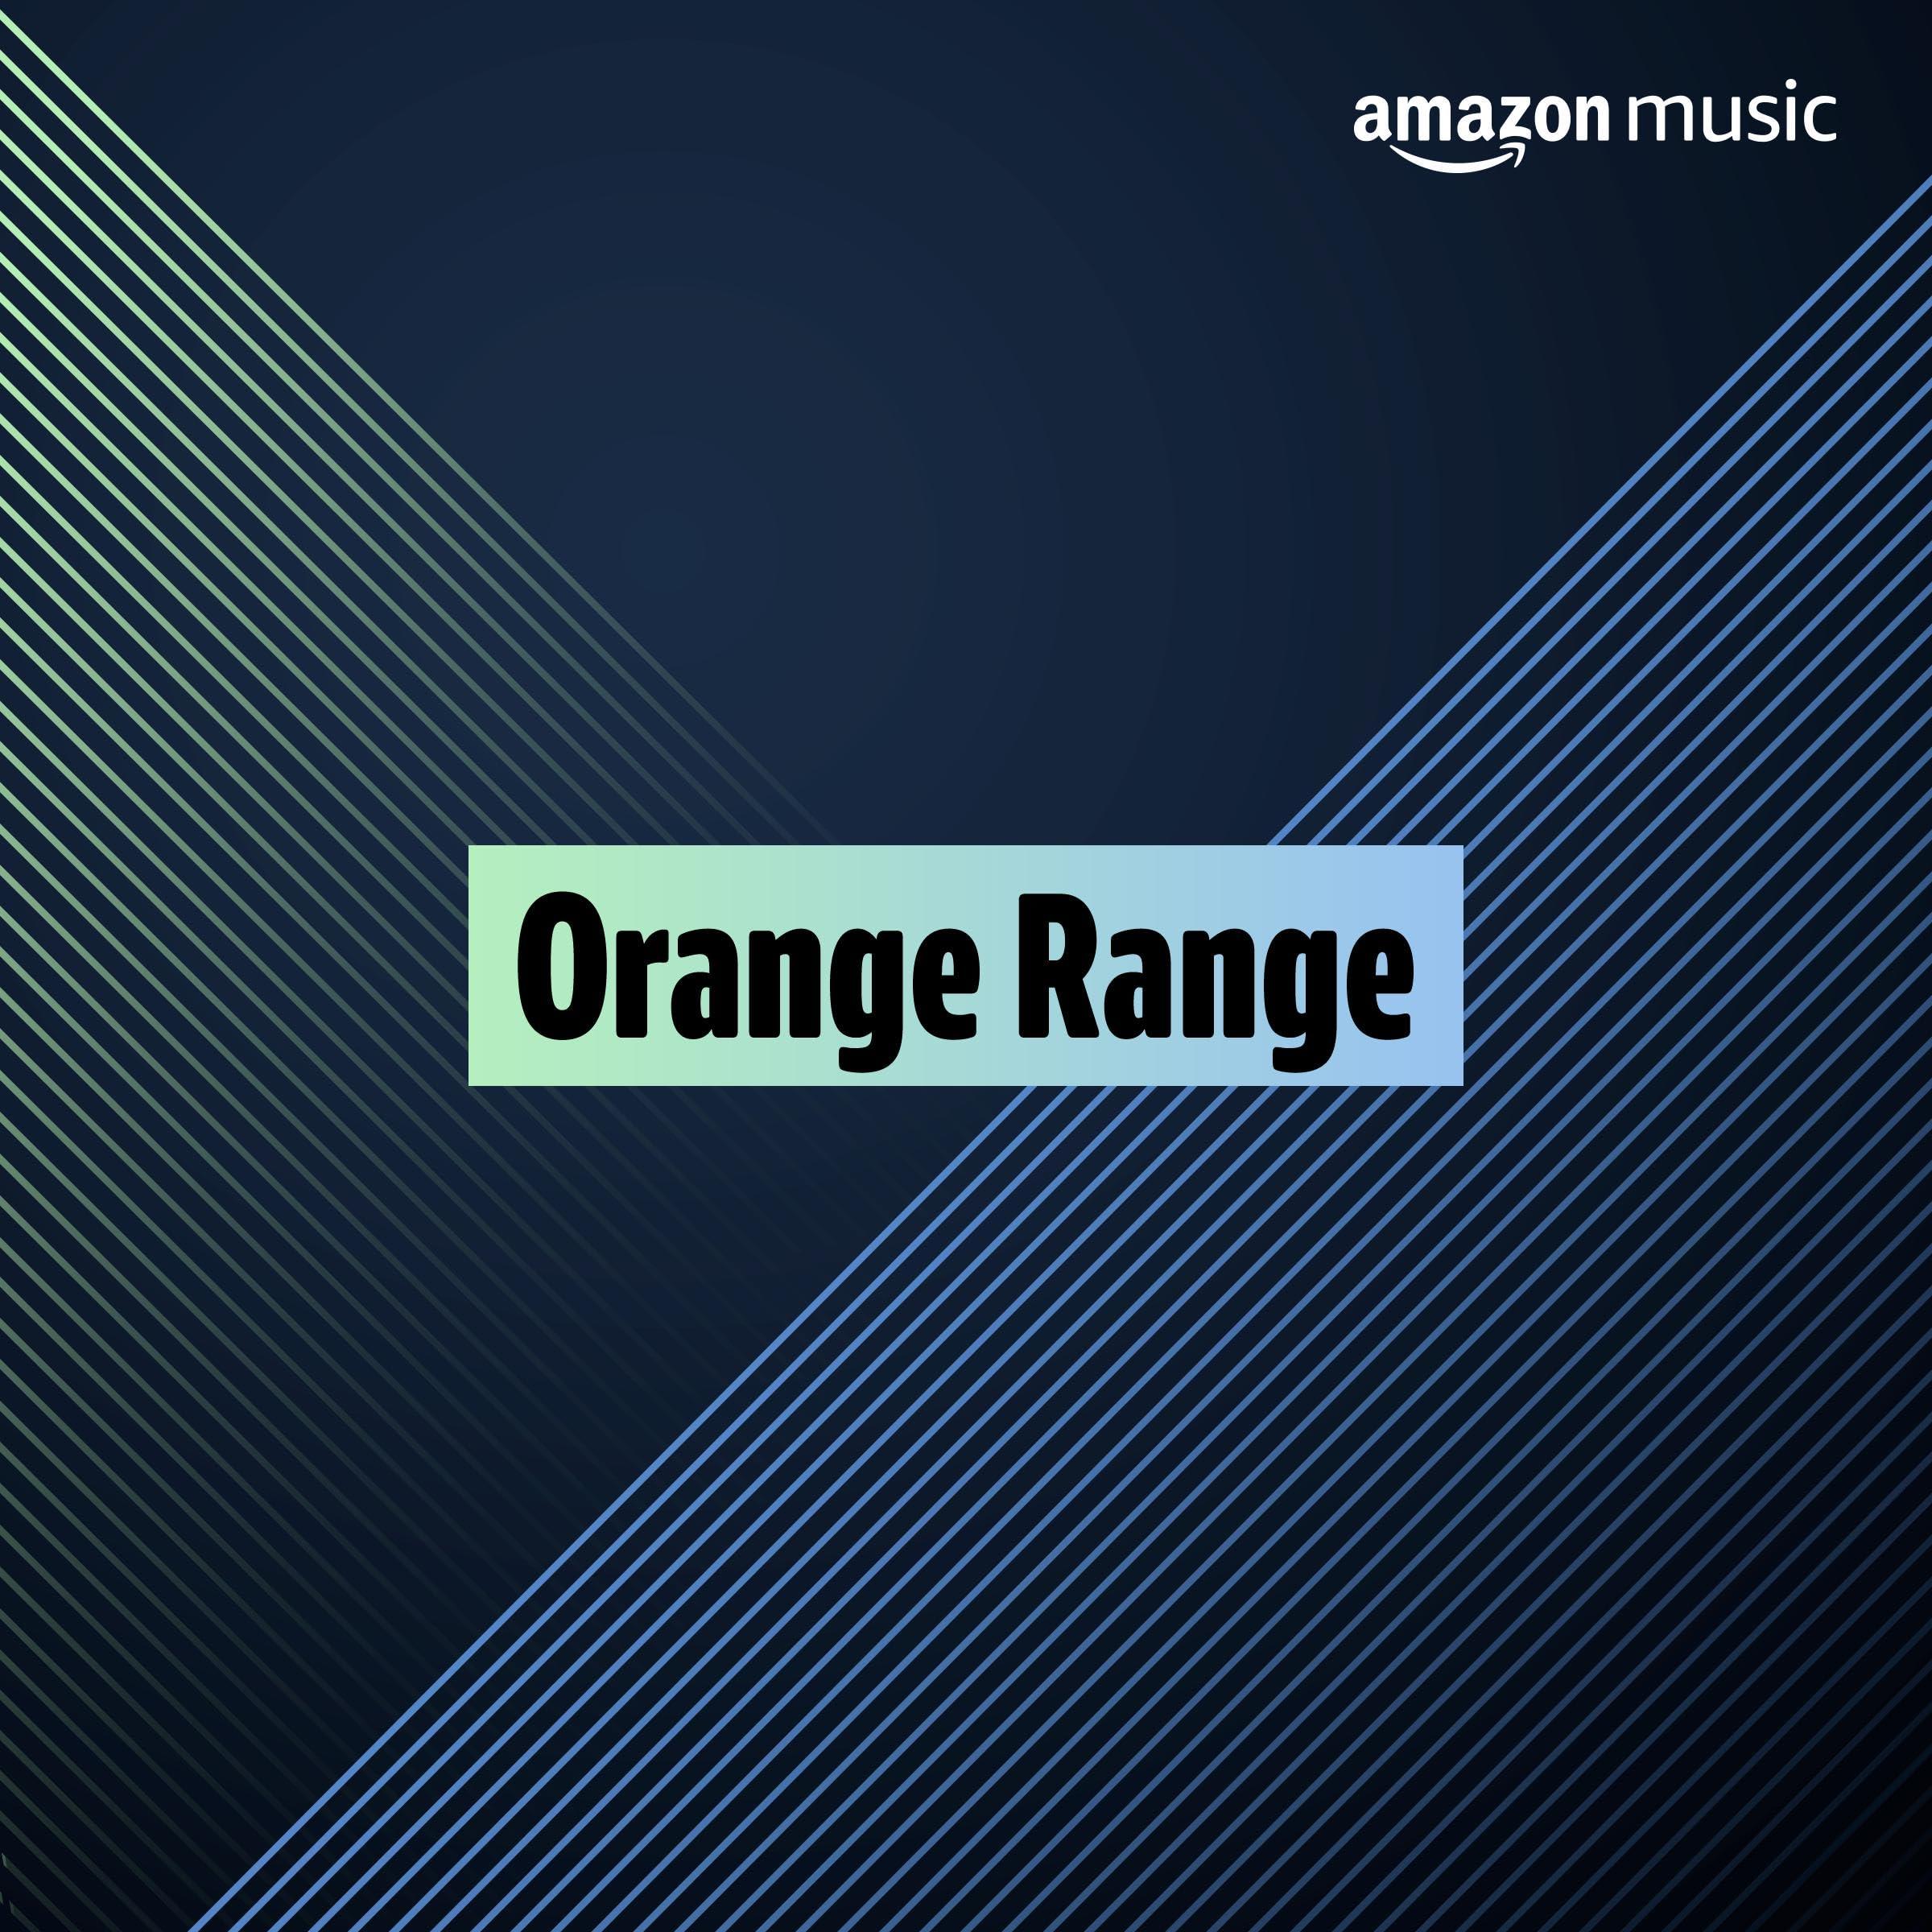 Orange Rangeを聴いているお客様におすすめ